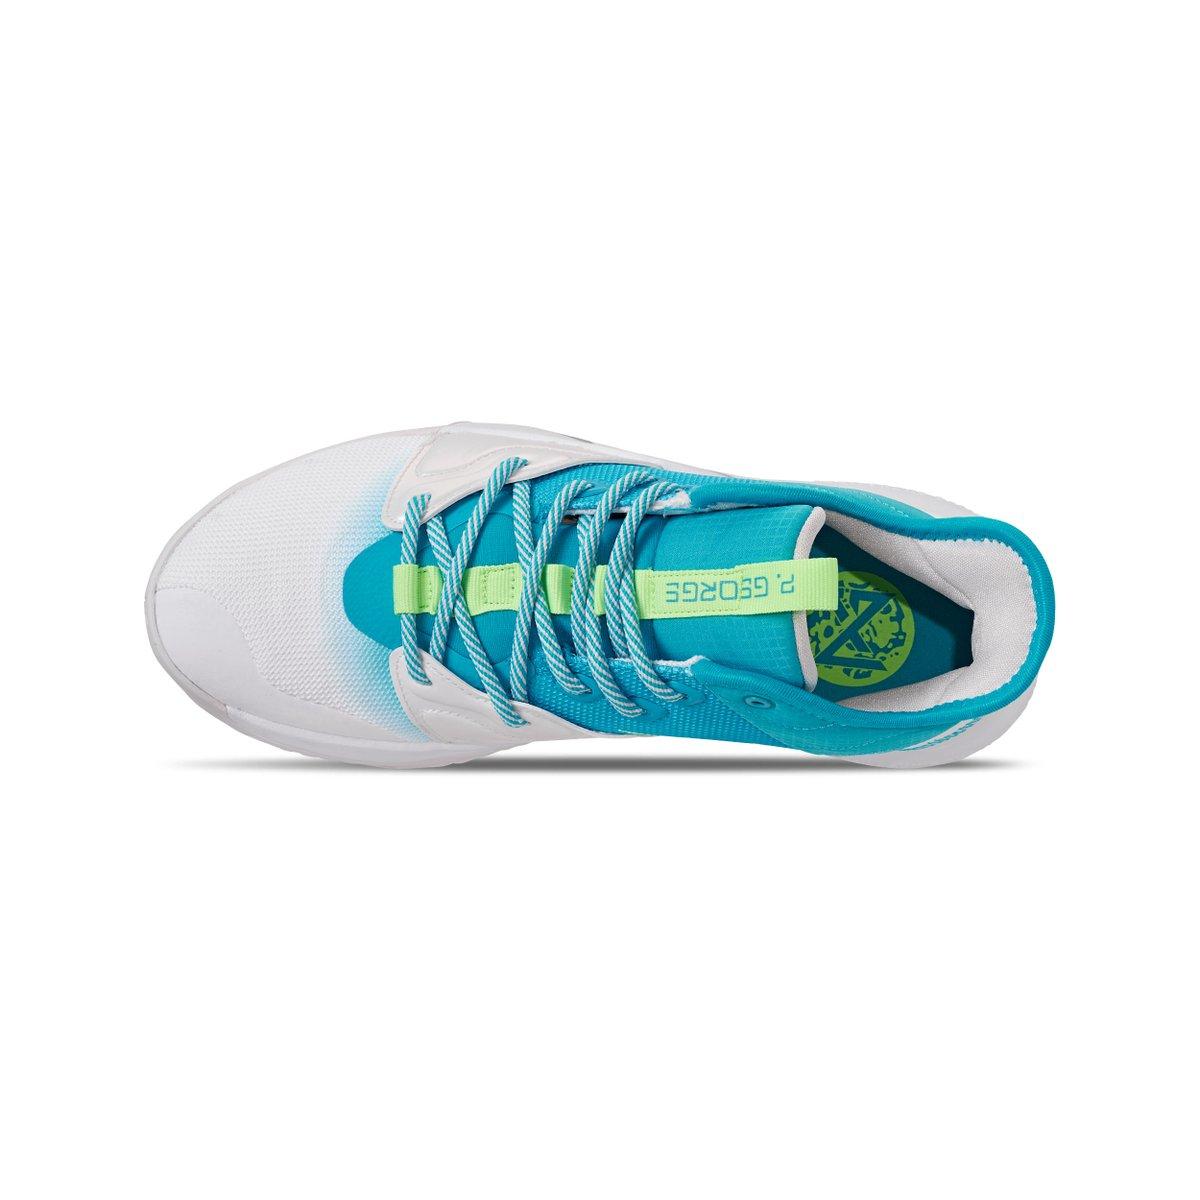 "Nike PG3 ""Lure"" ,潮鞋-莆田鞋-精仿鞋-高仿鞋"